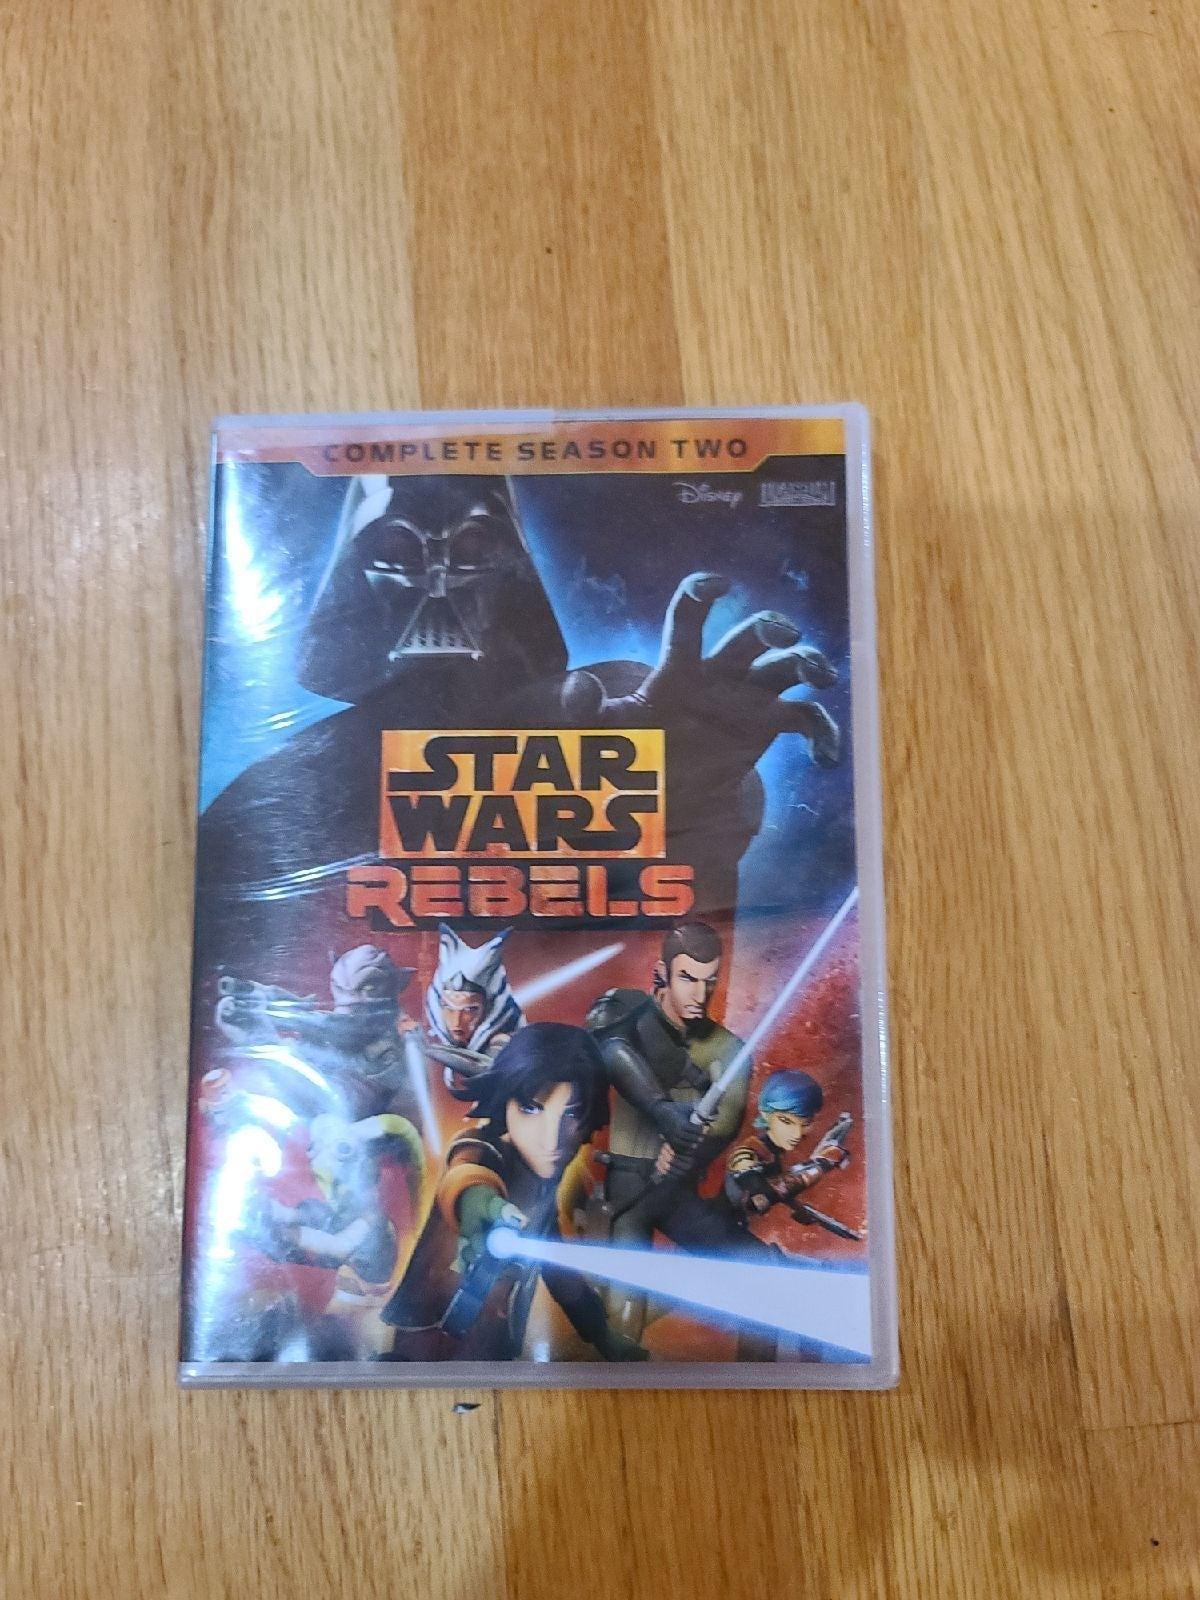 DVD Star Wars Rebels complete season two